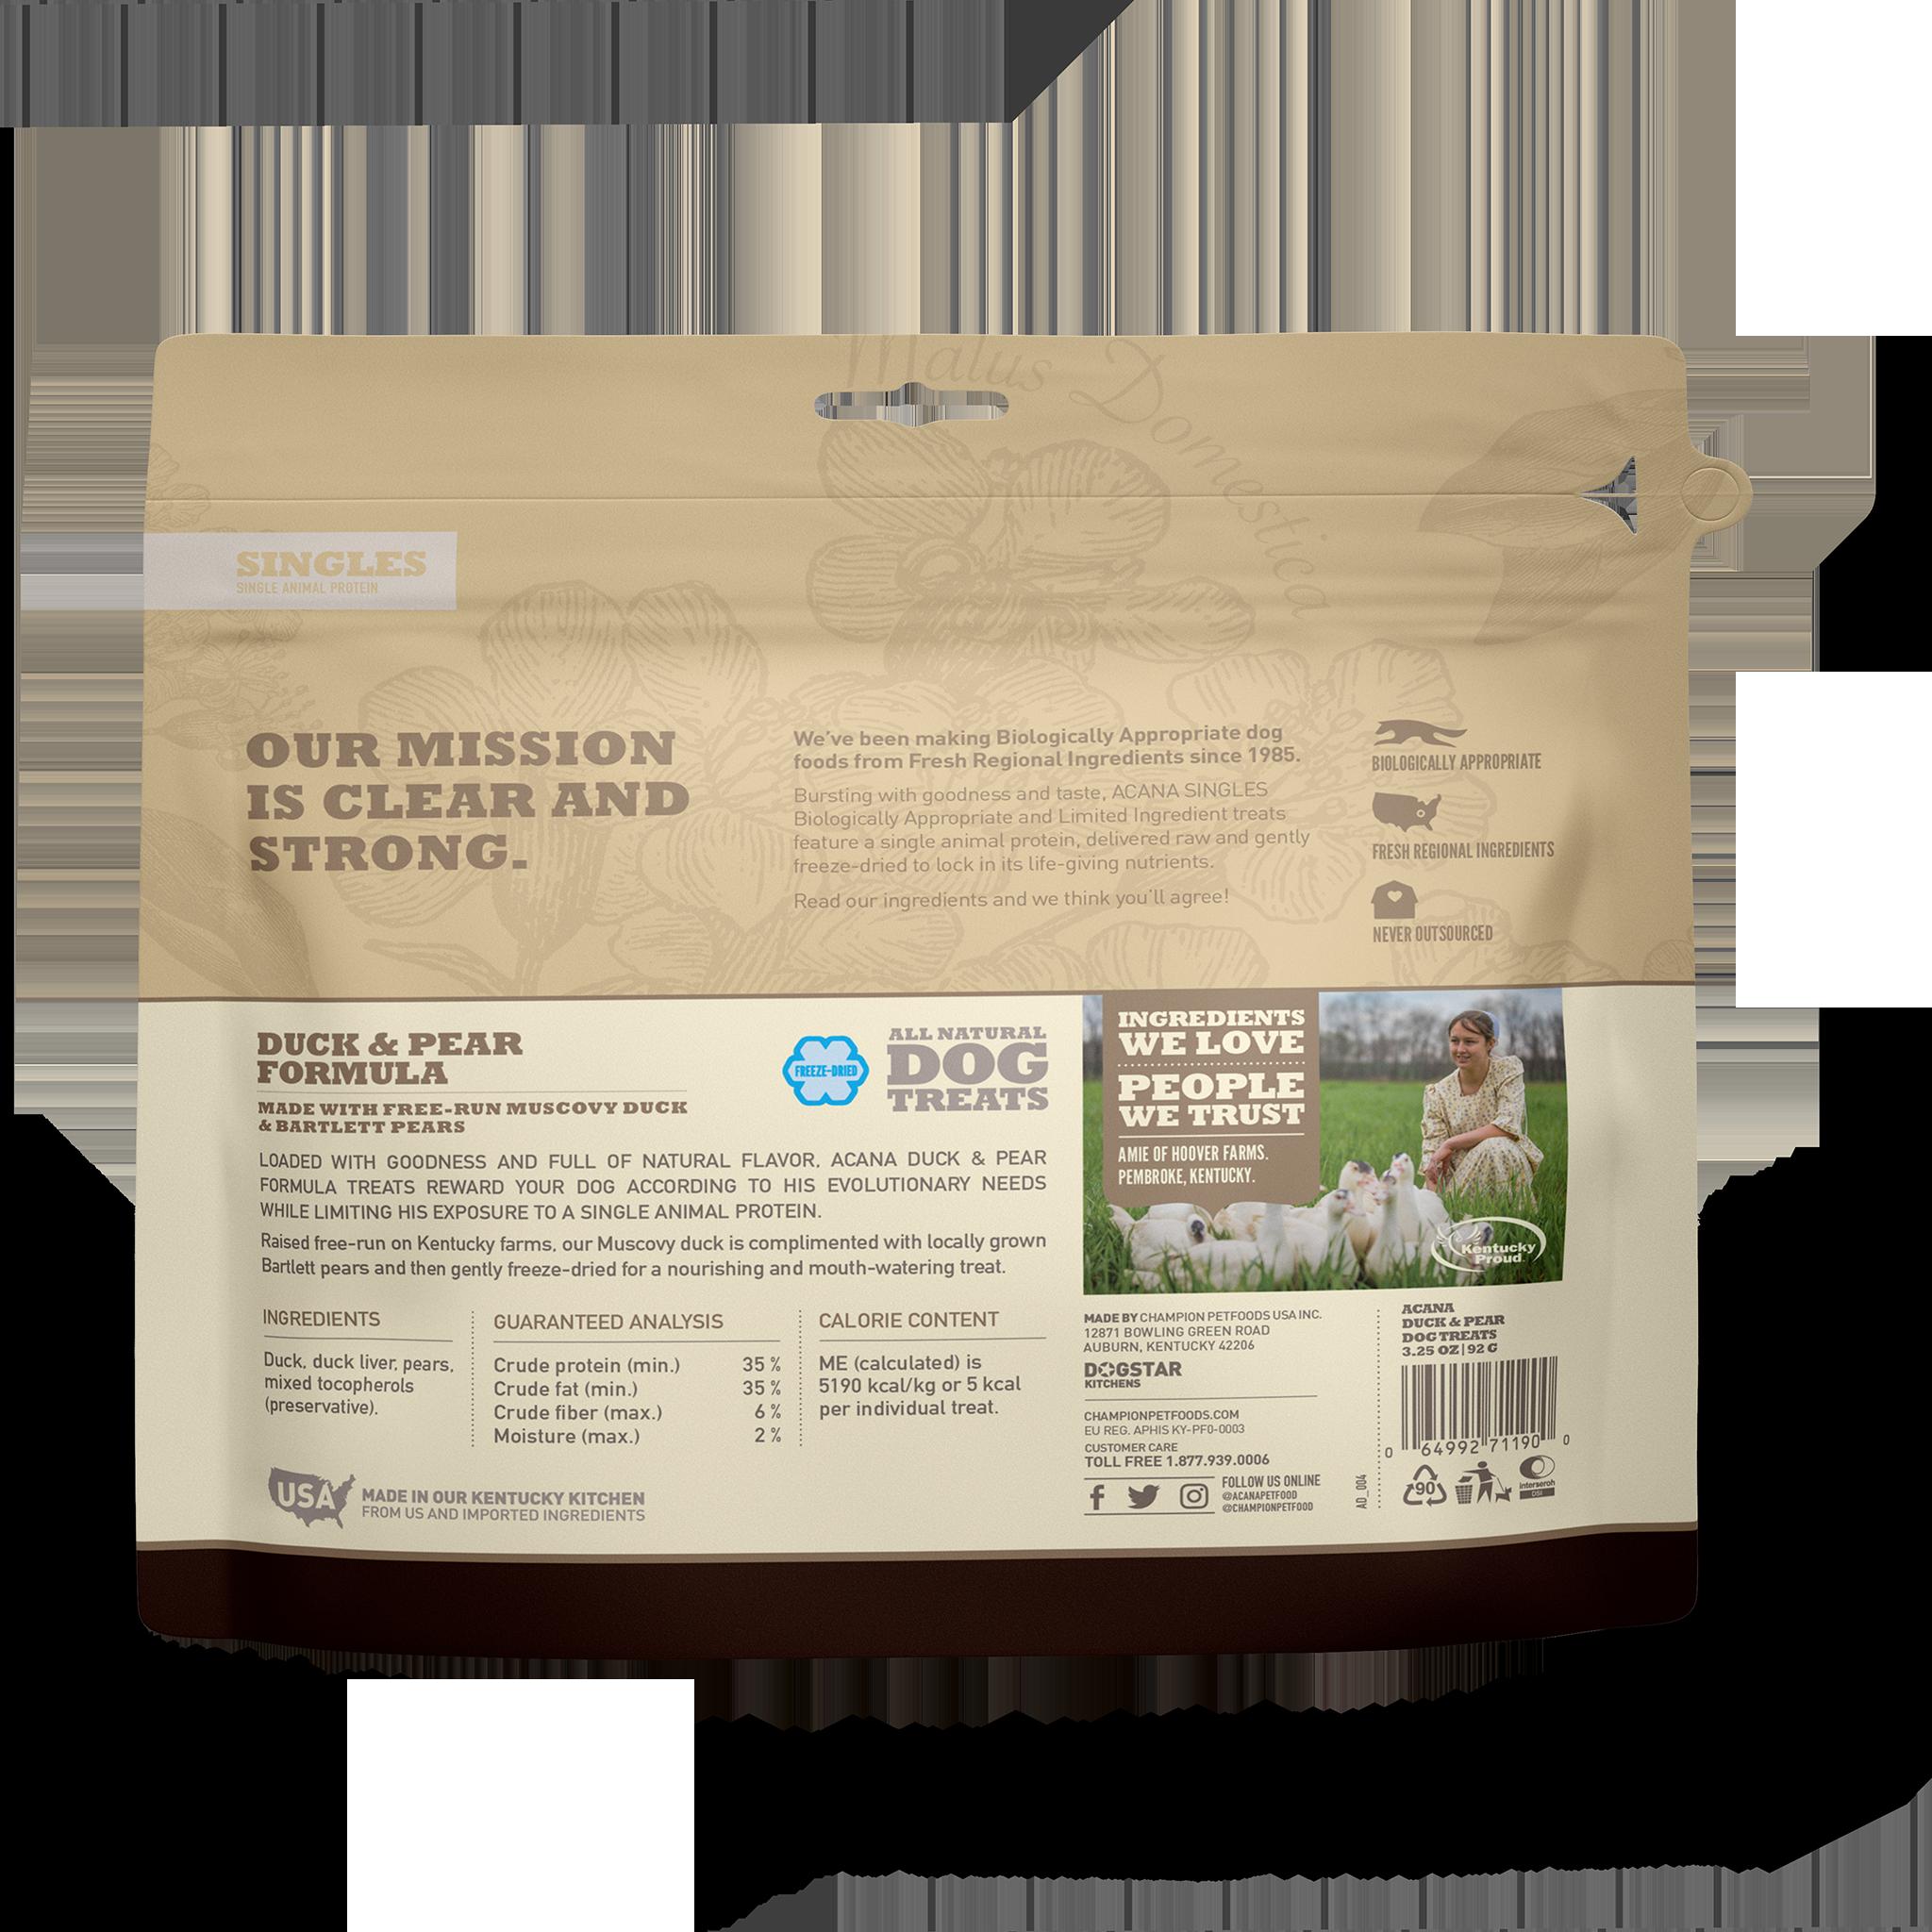 Acana Acana Freeze Dried Duck & Pear Dog Treat 3.25oz